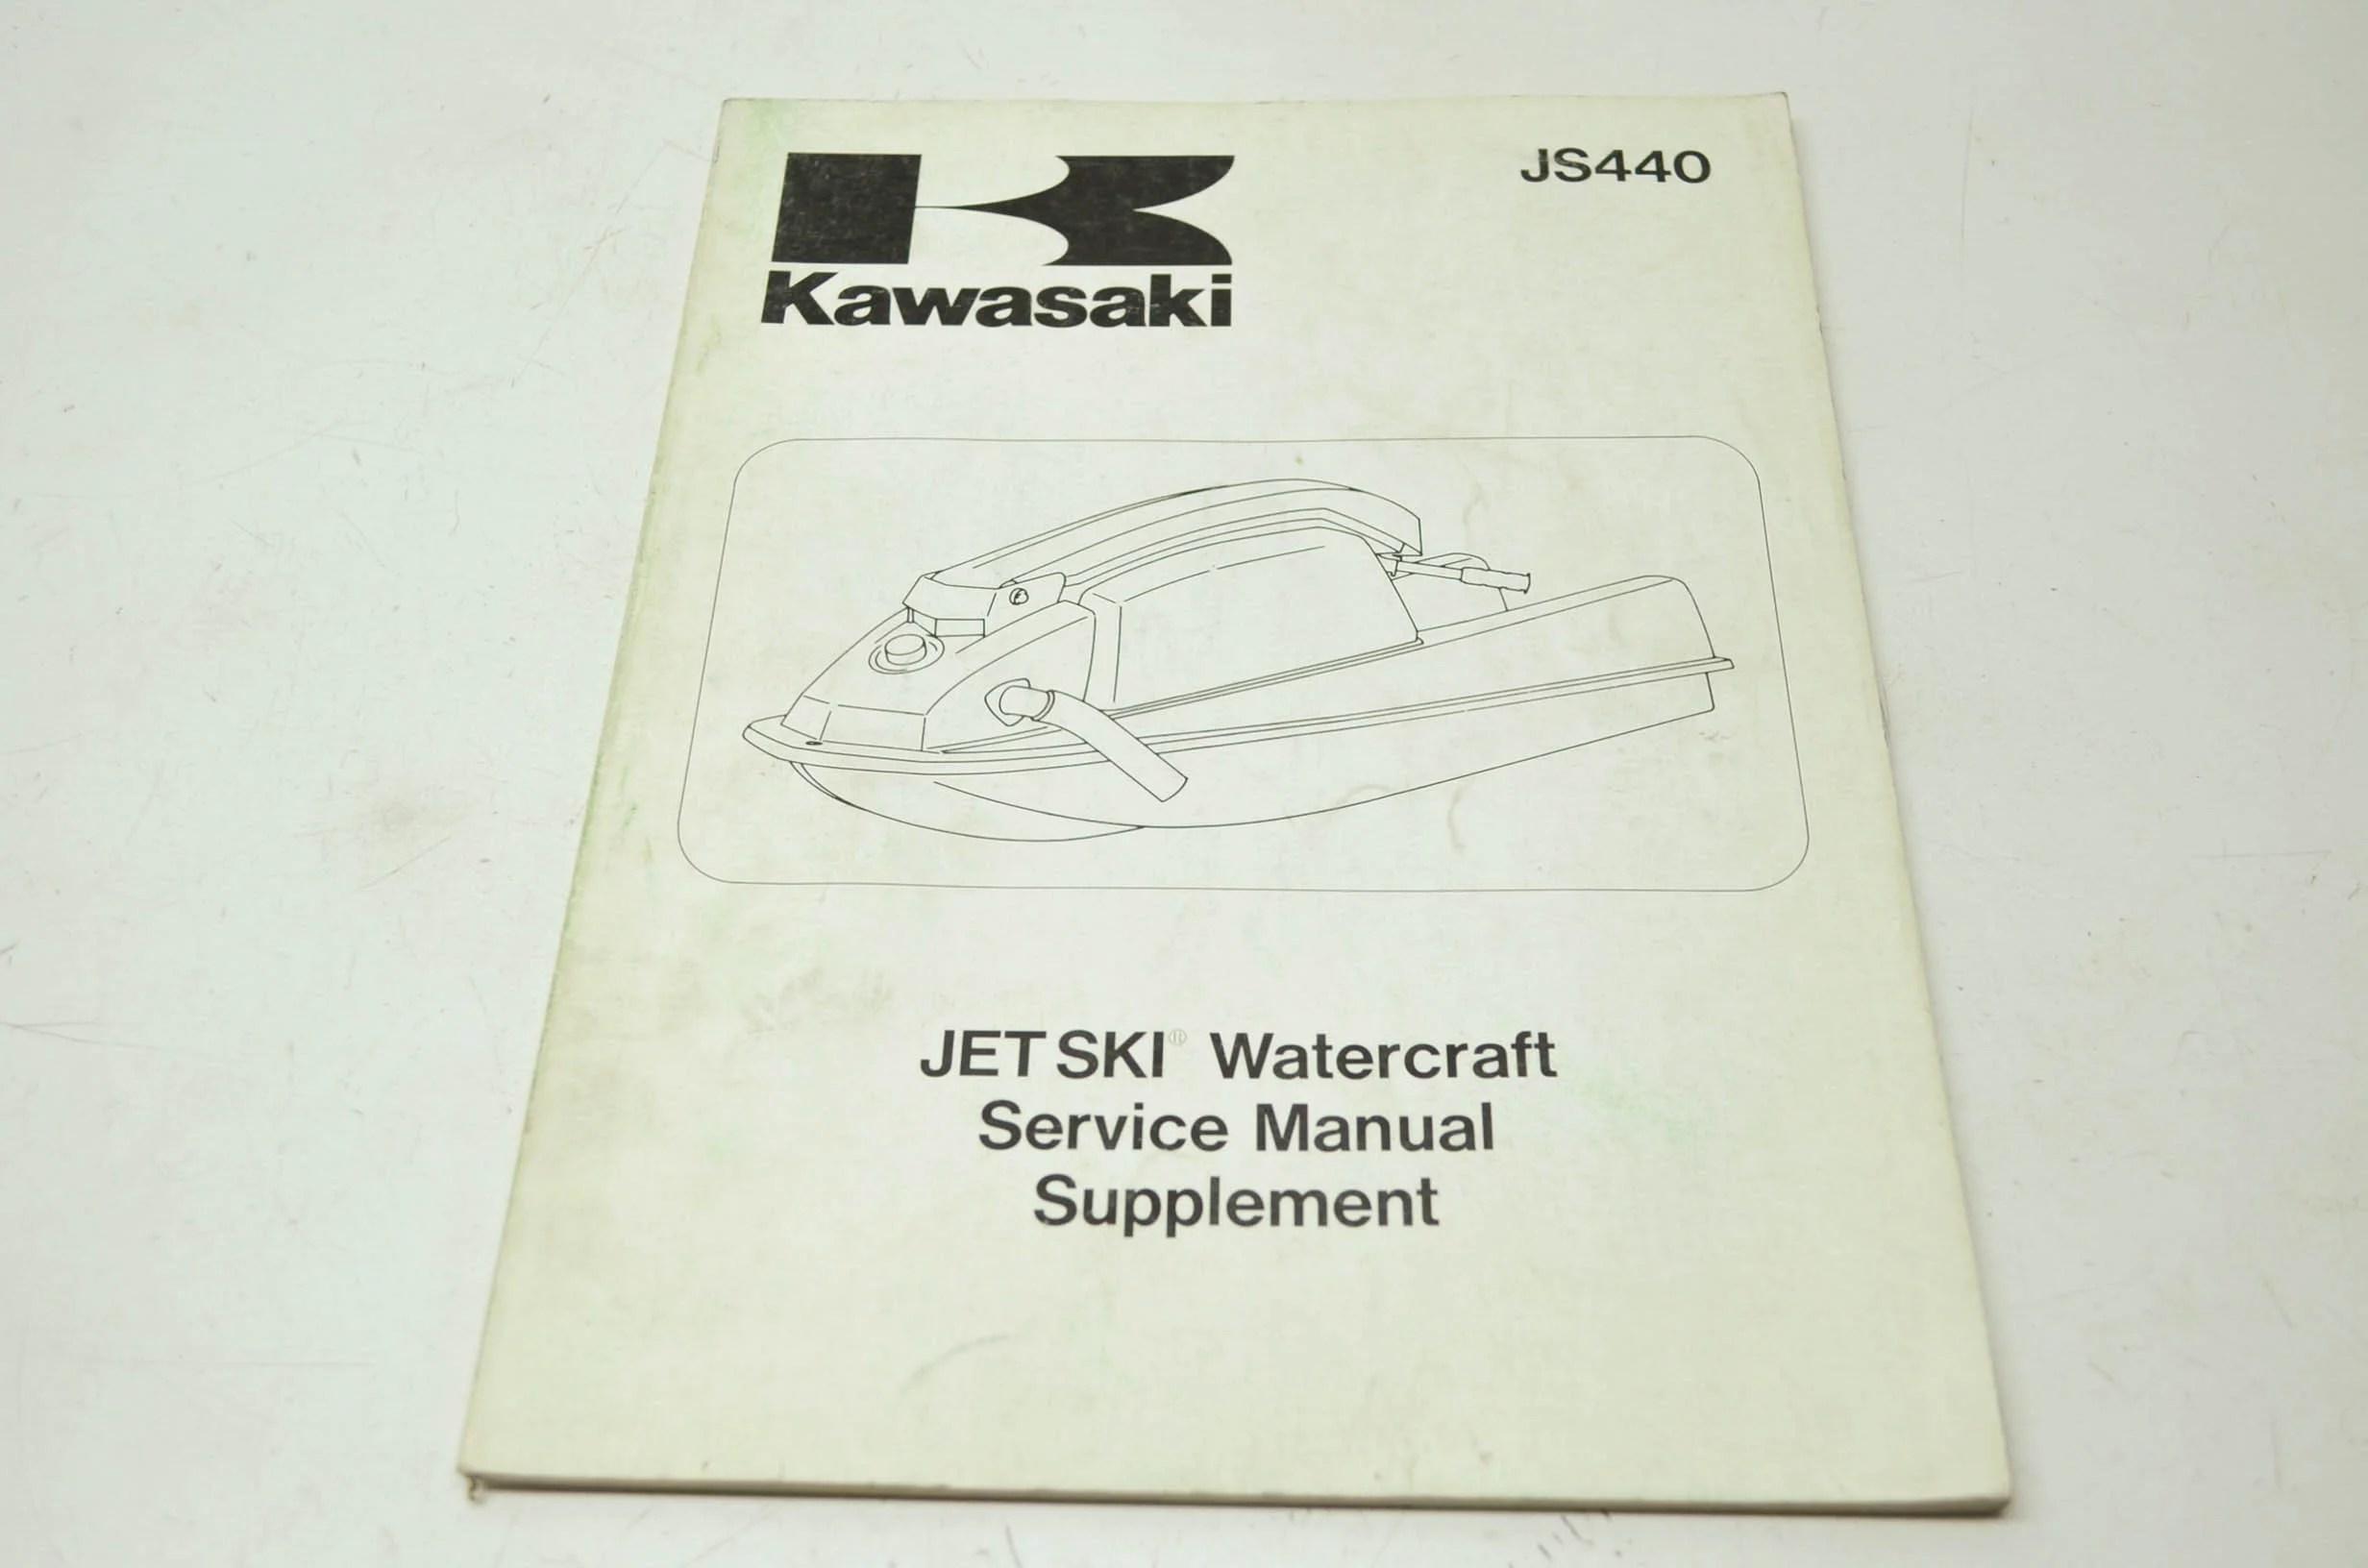 hight resolution of kawasaki 99924 1091 51 js440 jet ski service manual supplement qty 1 superior broom wiring diagrams